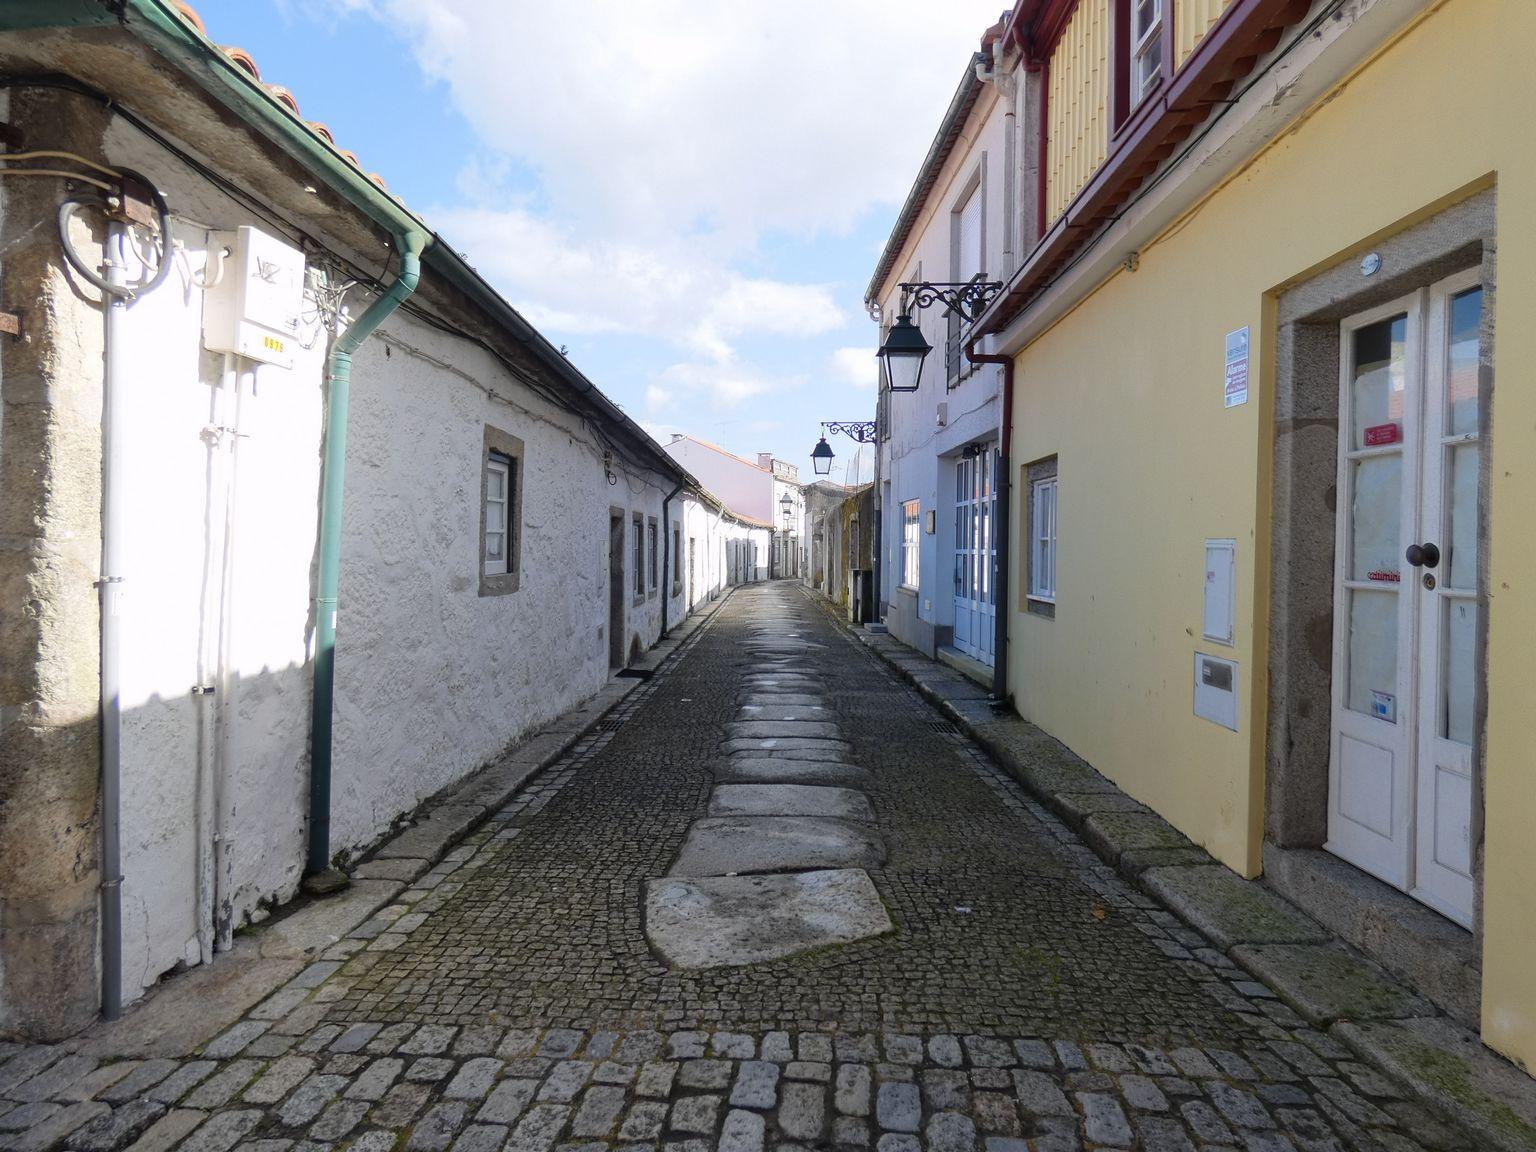 Viana do Castelo mars 2020 (54)